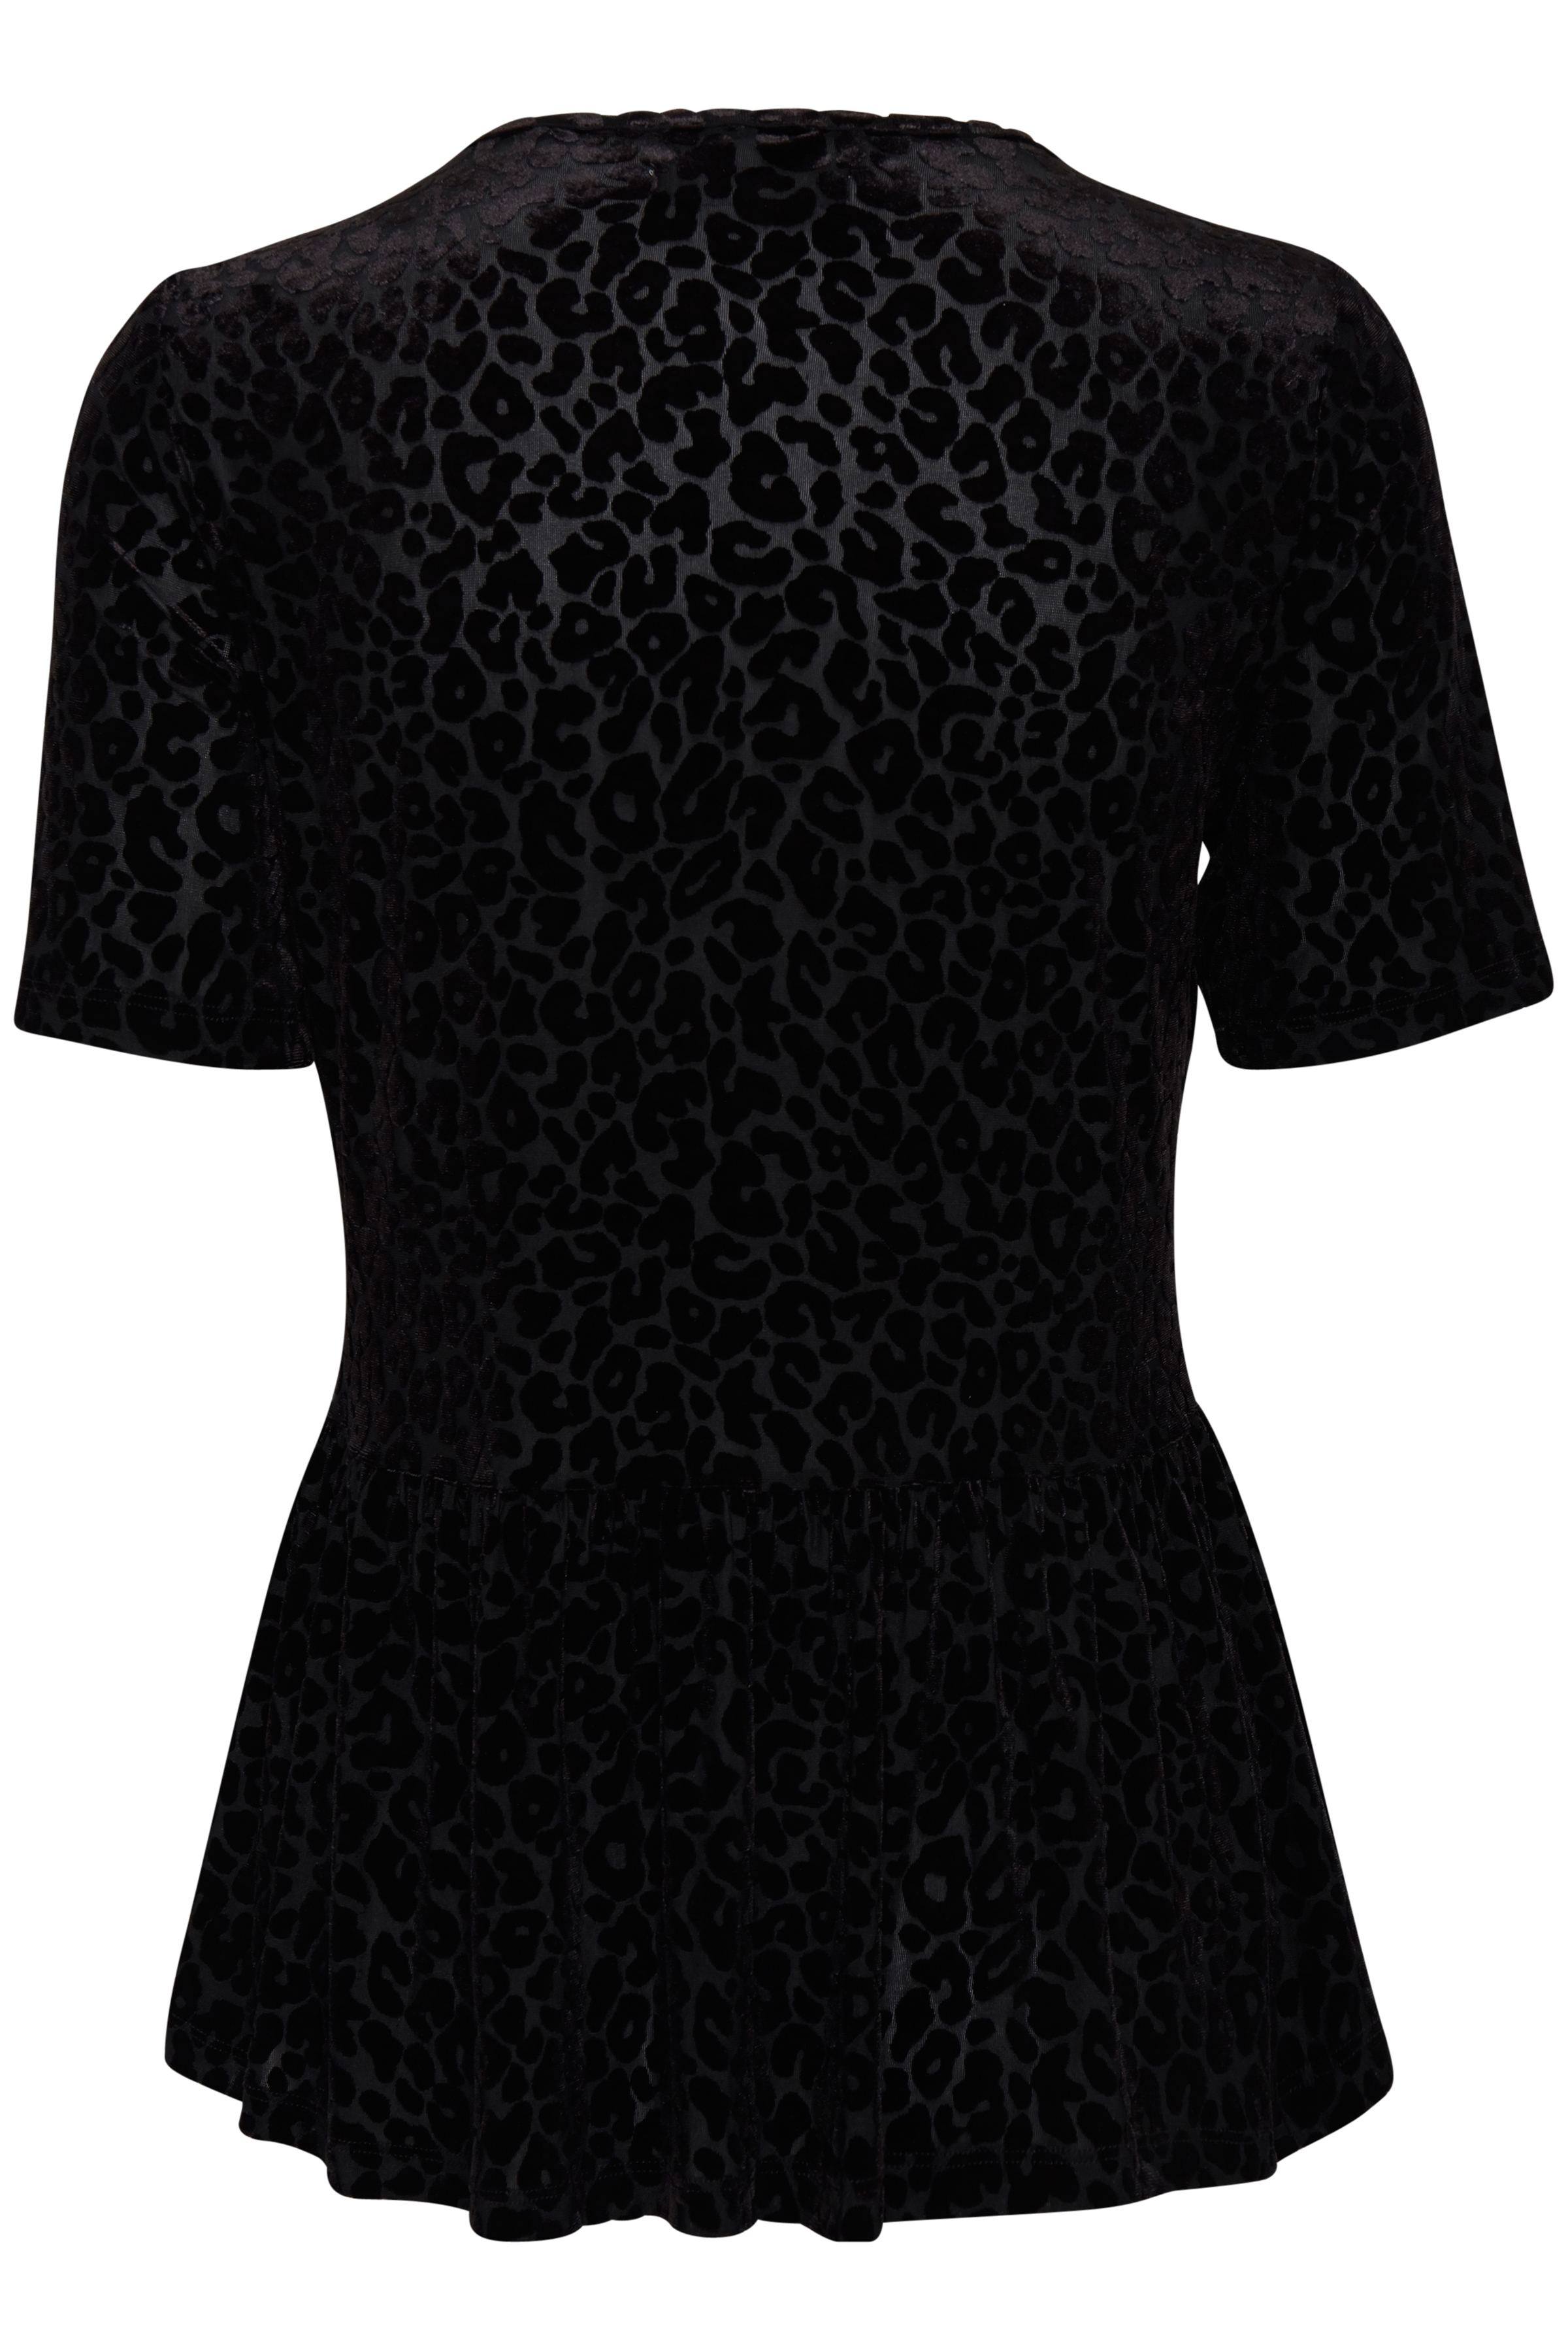 Black Kurzarm T-Shirt von b.young – Shoppen Sie Black Kurzarm T-Shirt ab Gr. XS-XXL hier